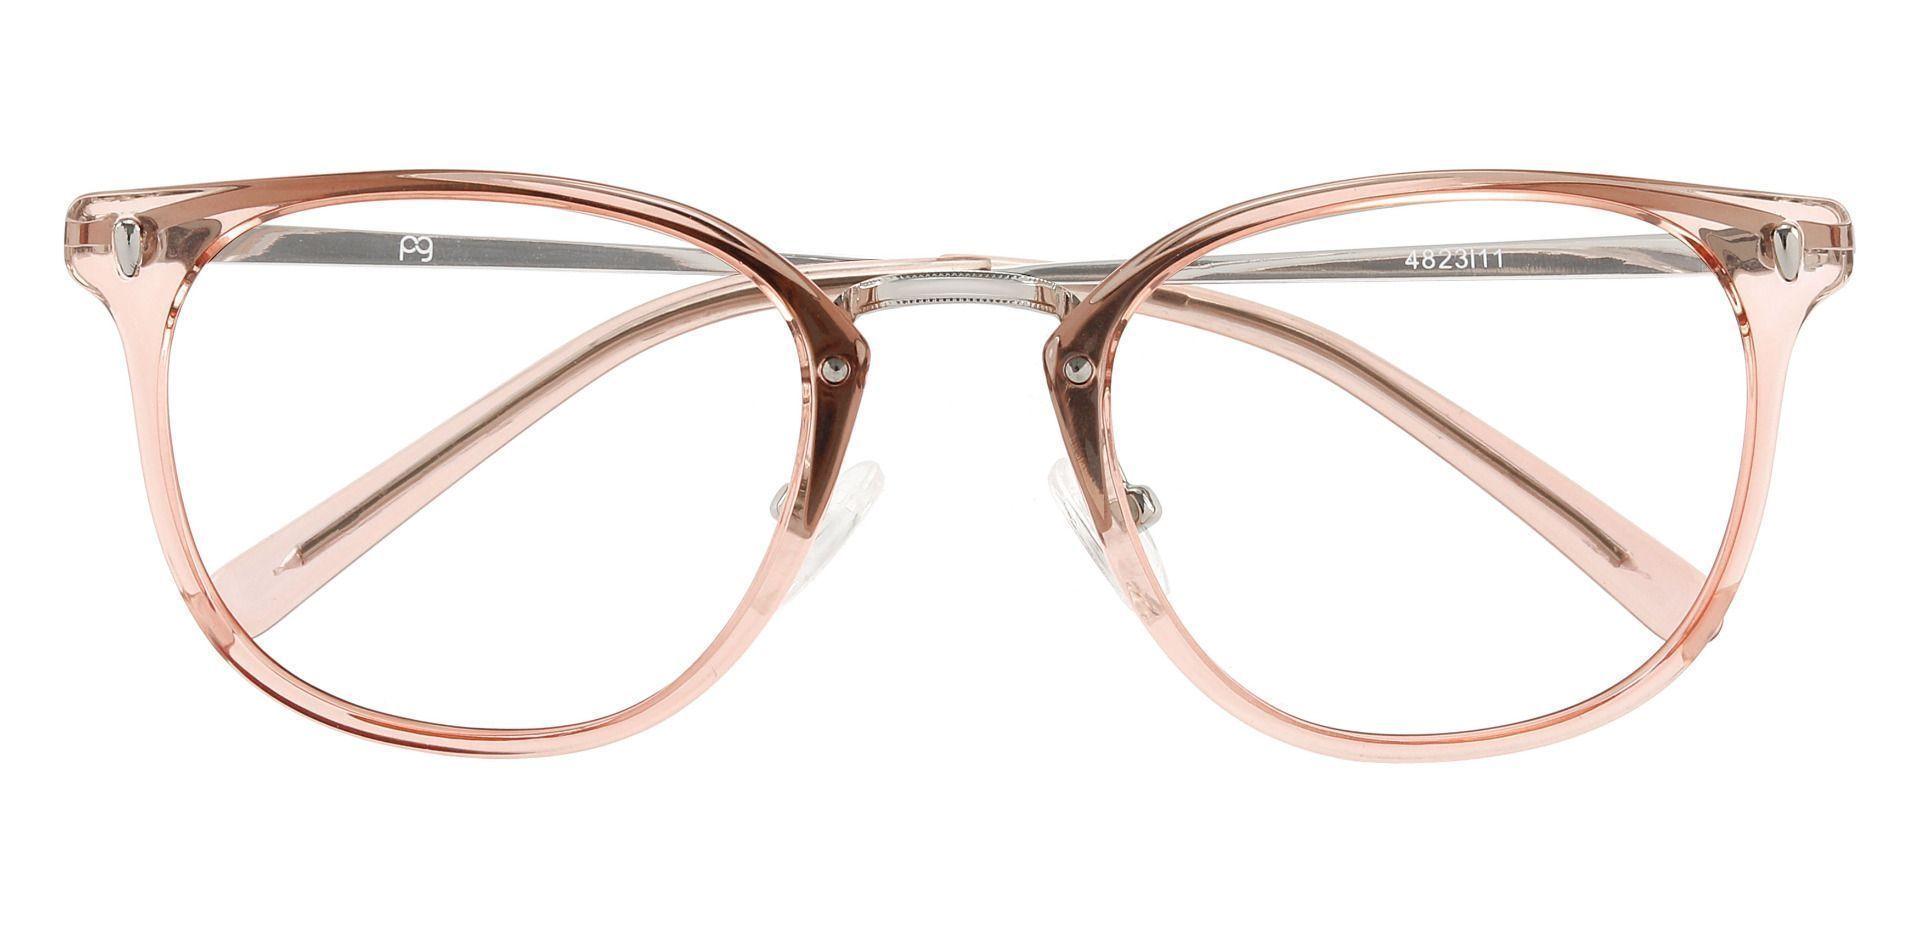 St. Clair Oval Prescription Glasses - Pink